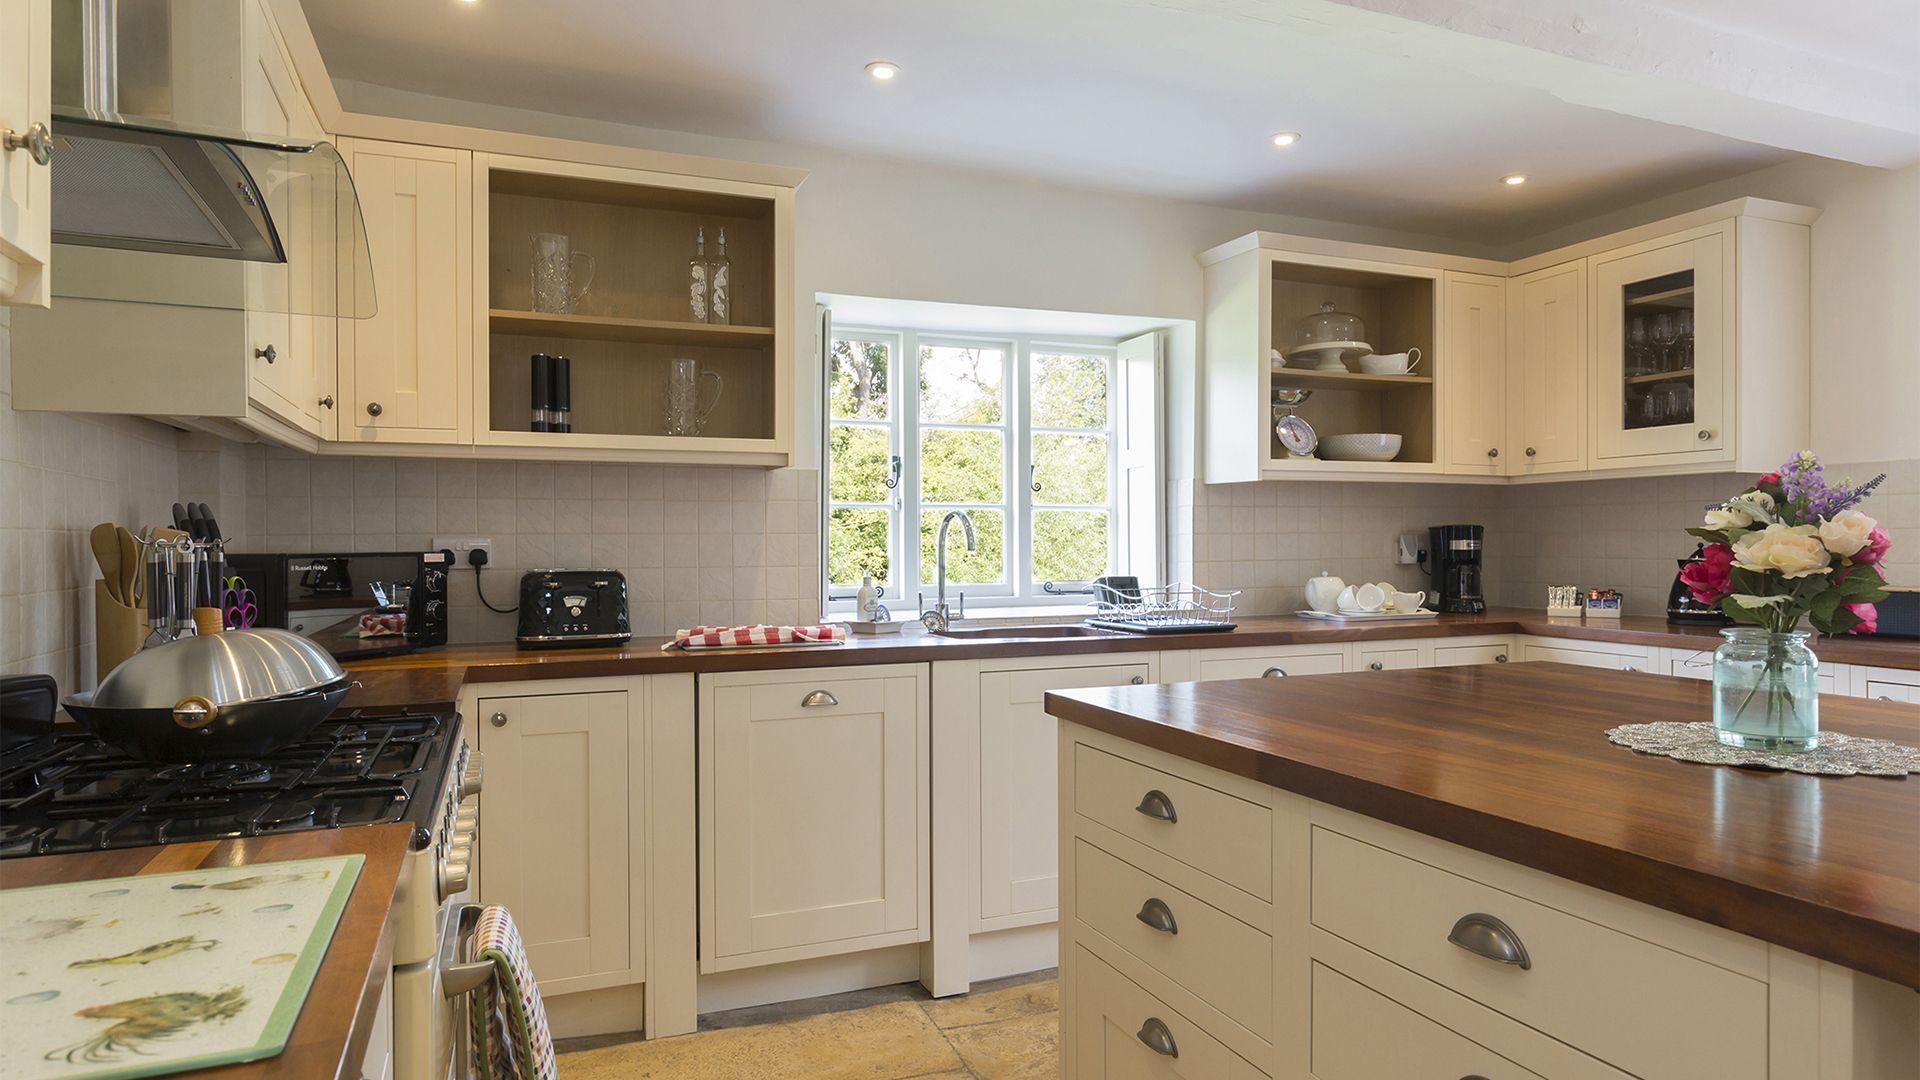 Kitchen, Almsbury Farmhouse at Sudeley Castle, Bolthole Retreats